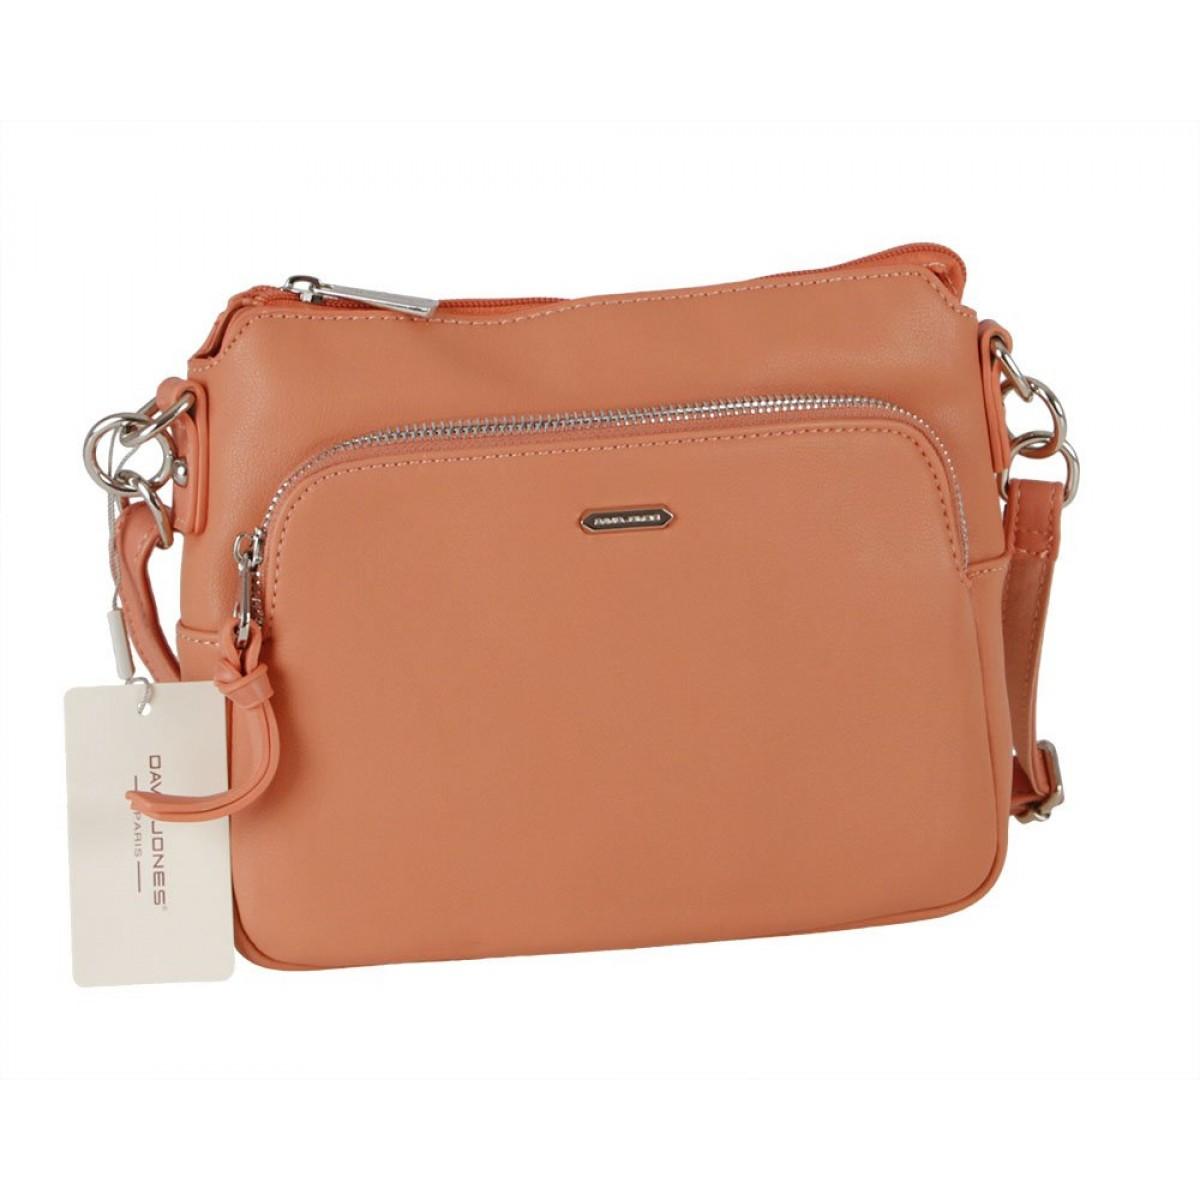 Жіноча сумка David Jones 6299-1 CORAL